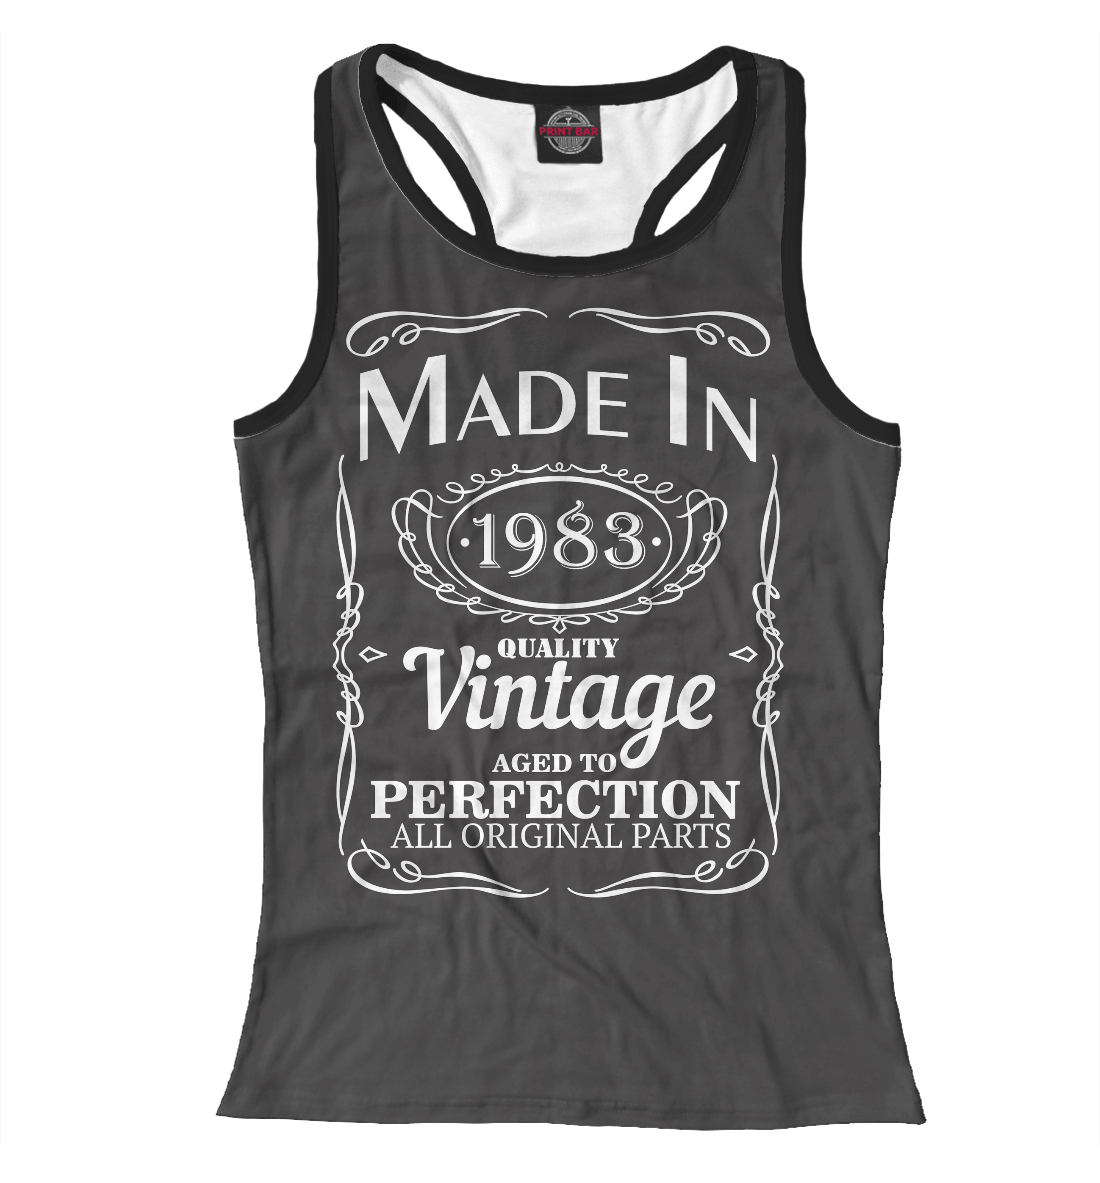 Купить Сделано в 1983, Printbar, Майки борцовки, DVT-356236-mayb-1